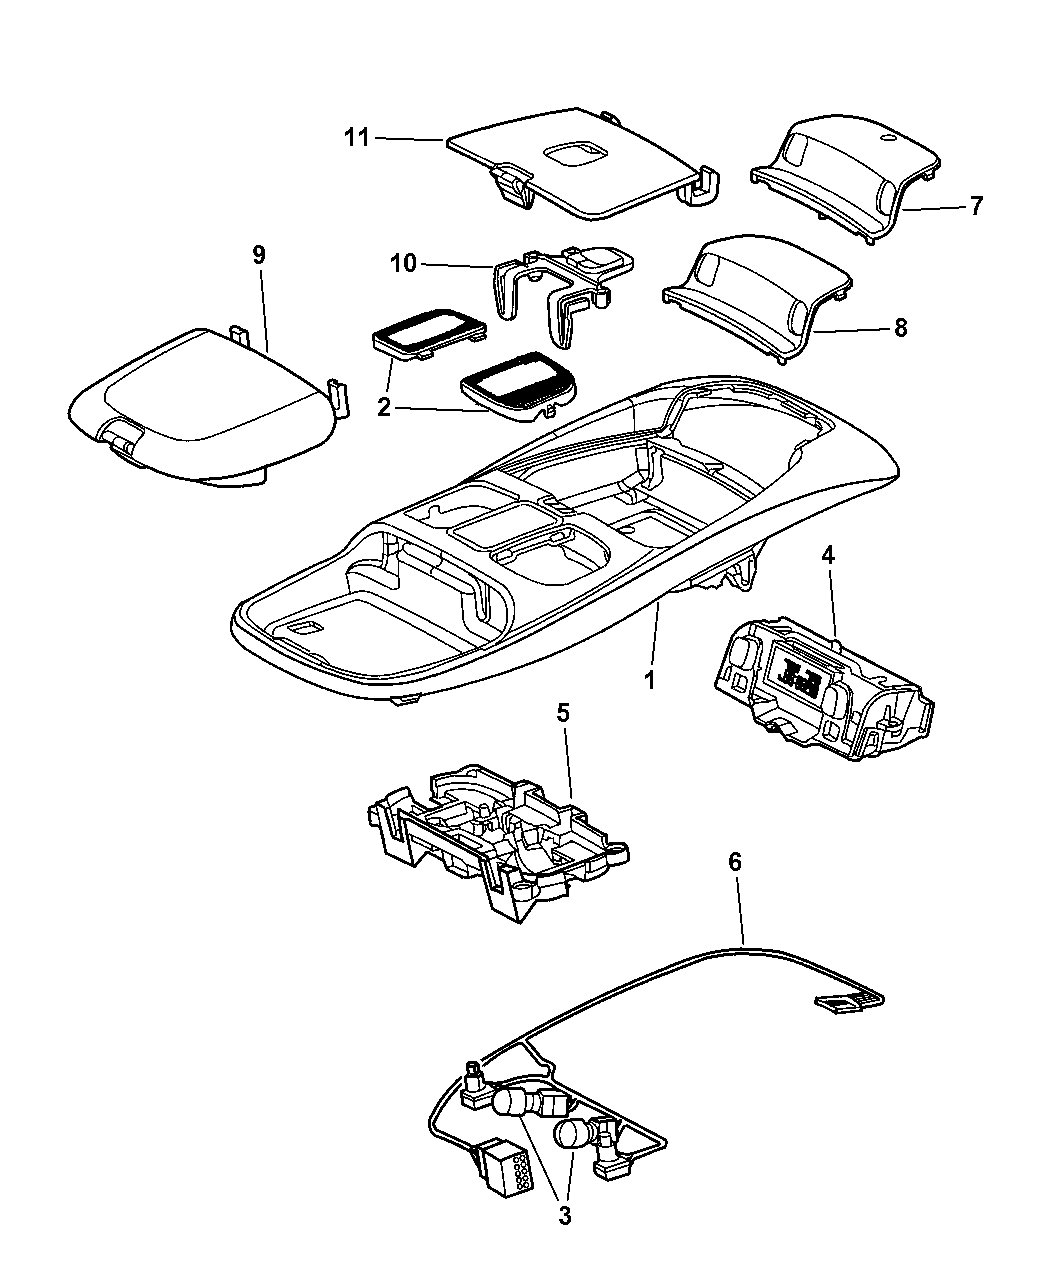 2000 Dodge Ram 1500 Quad & Club Cab Overhead Console